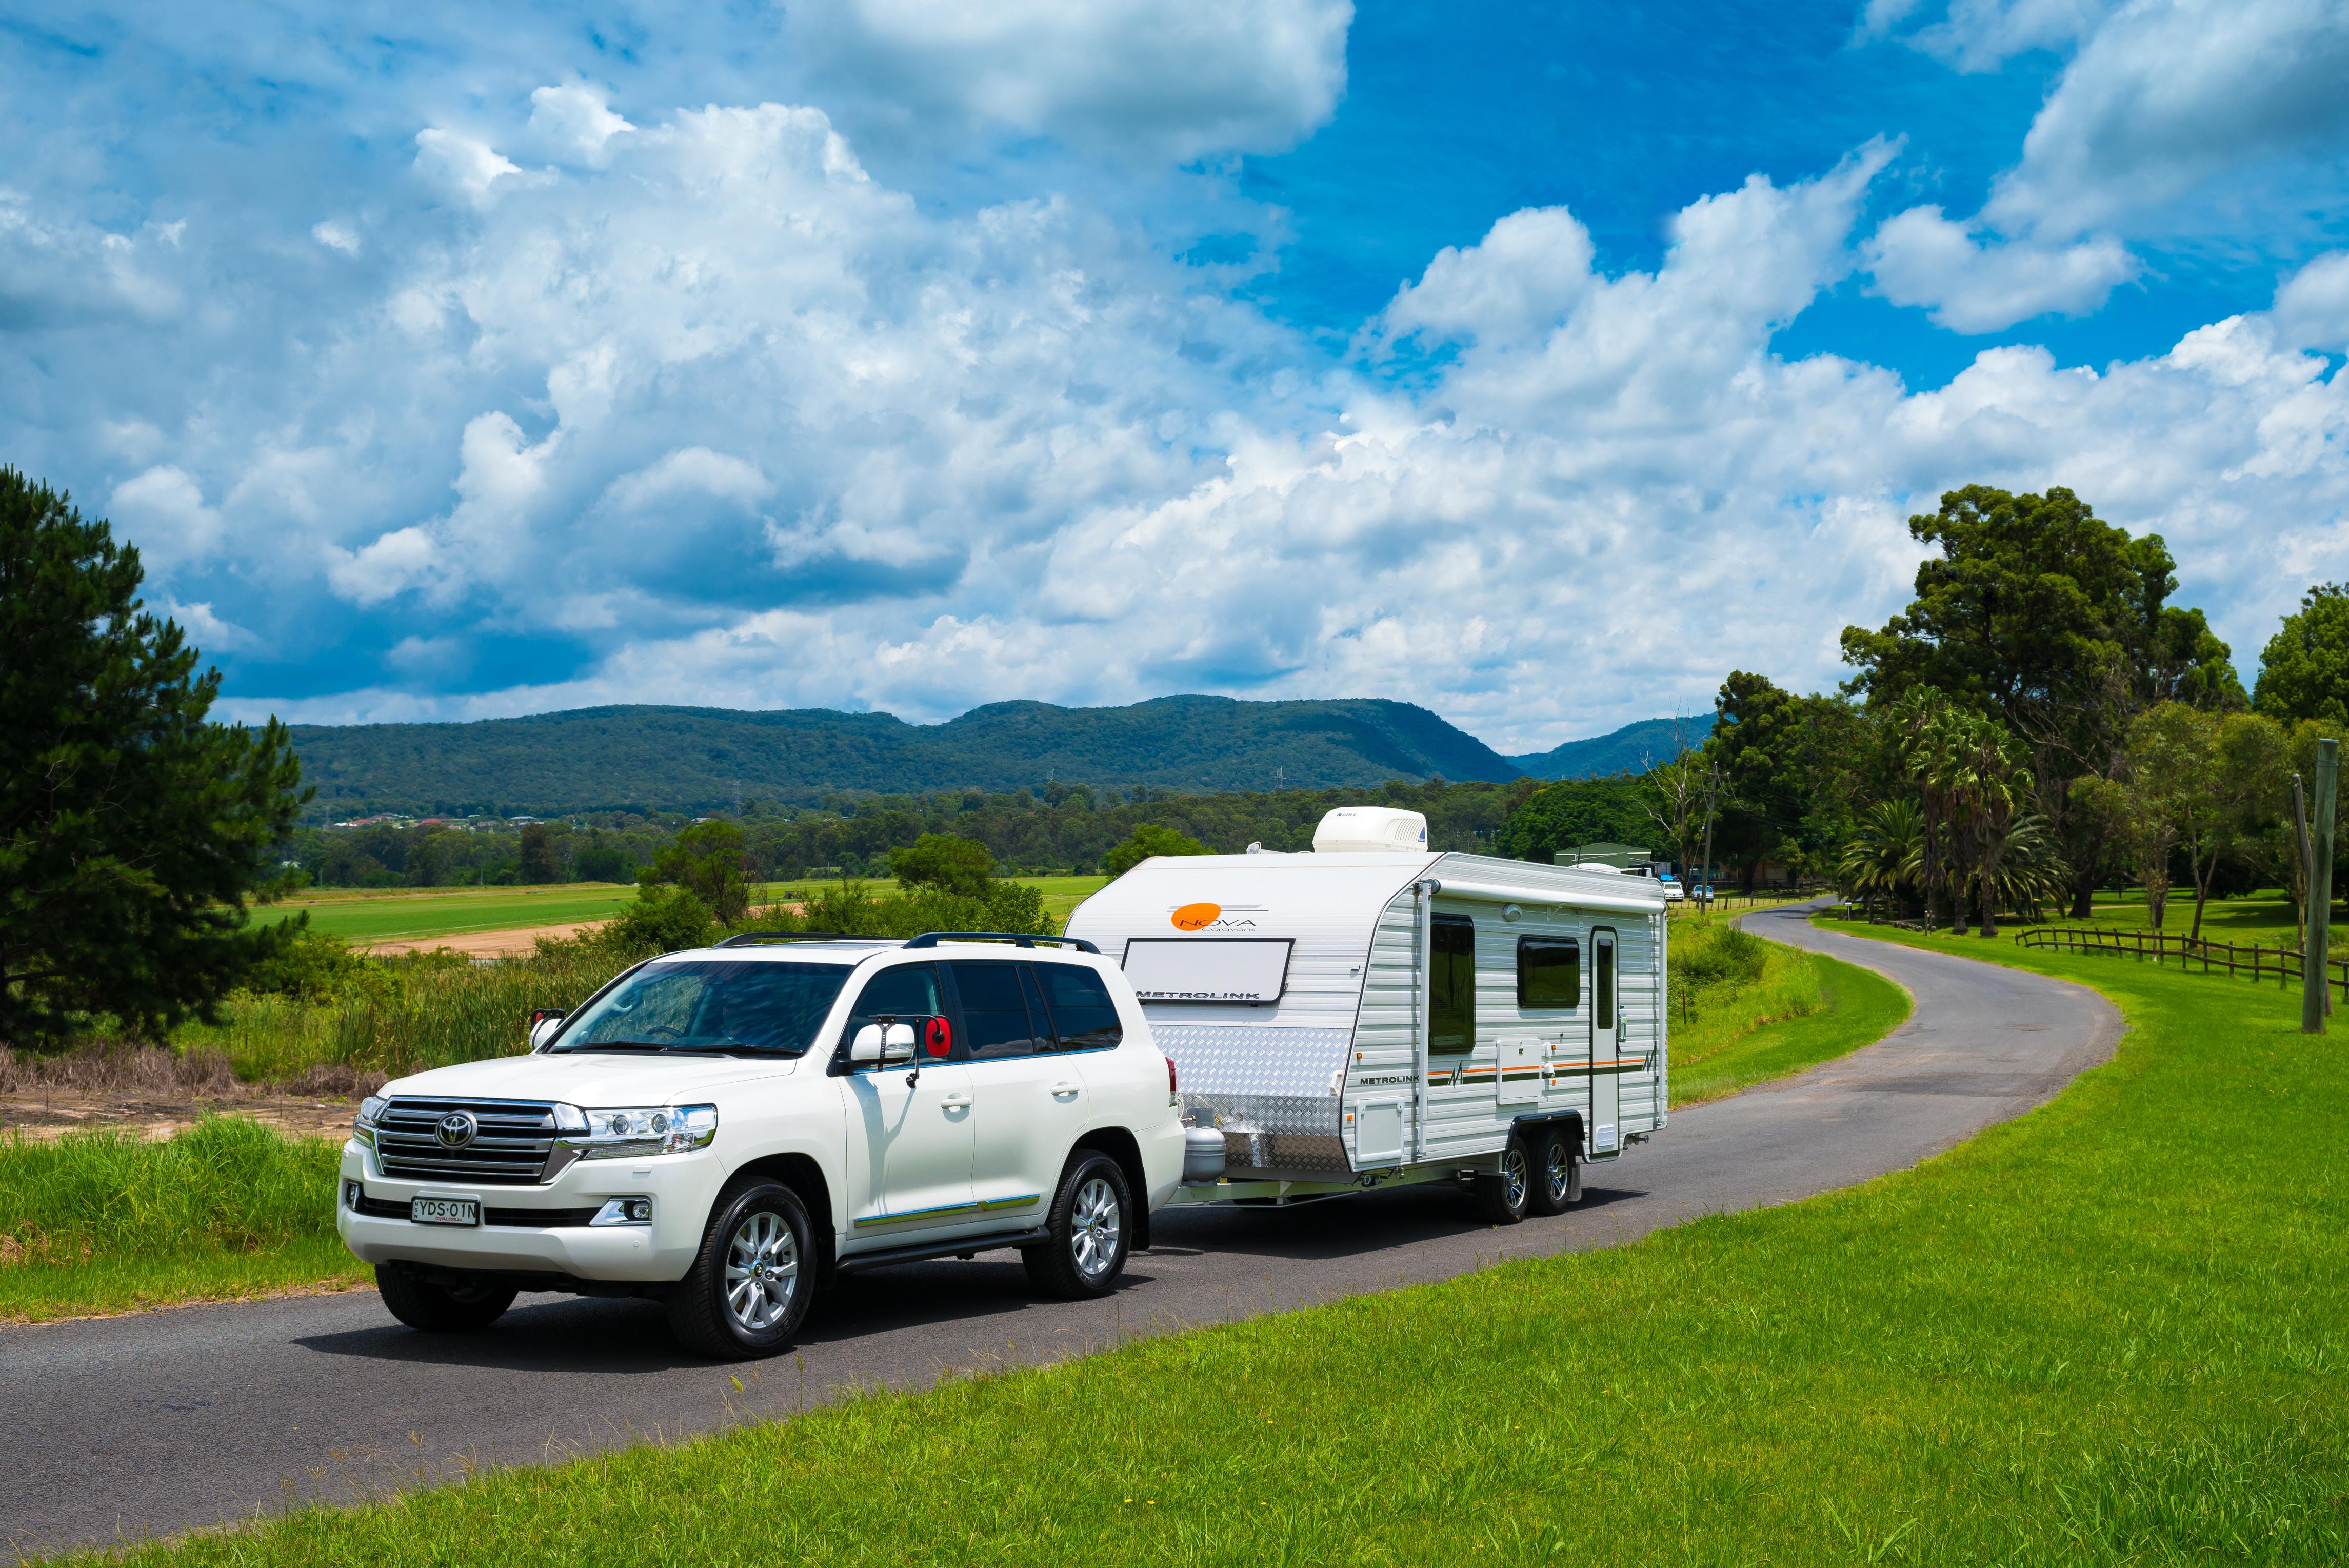 Top 10 Tow Vehicles Of 2016 Toyota Land Cruiser 200 Lift Kit Landcruiser Series